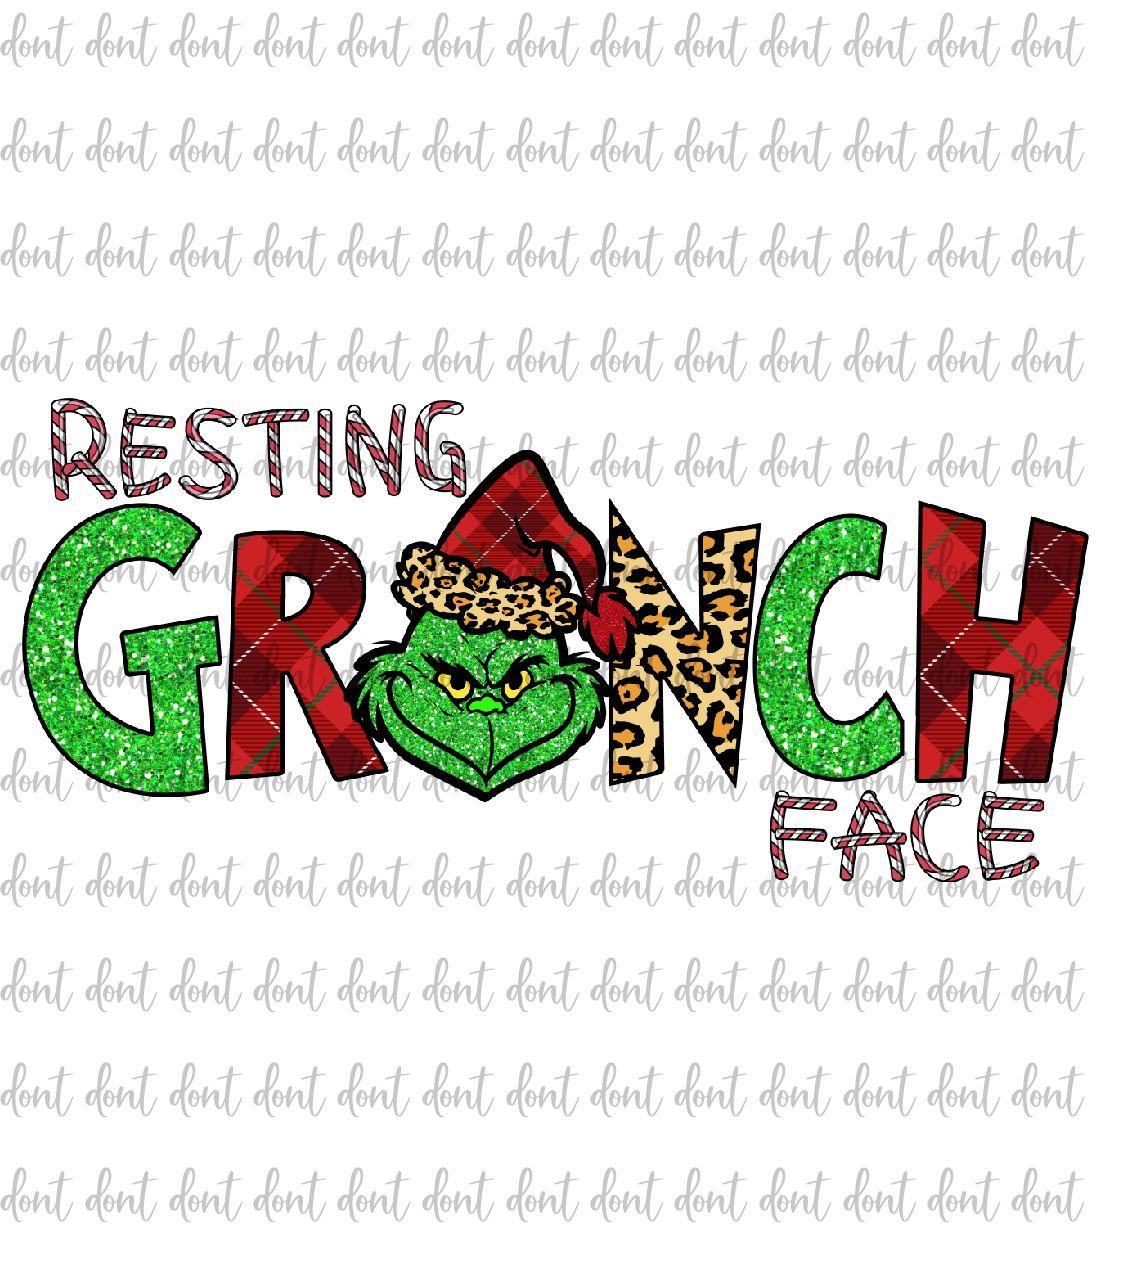 Resting Grinch Face Png Grinch Face Png Grinch Png Grinchmas Png Grinch Images Png Christmas Png Christmas Sublima Grinch Images Grinch Png Resting Face